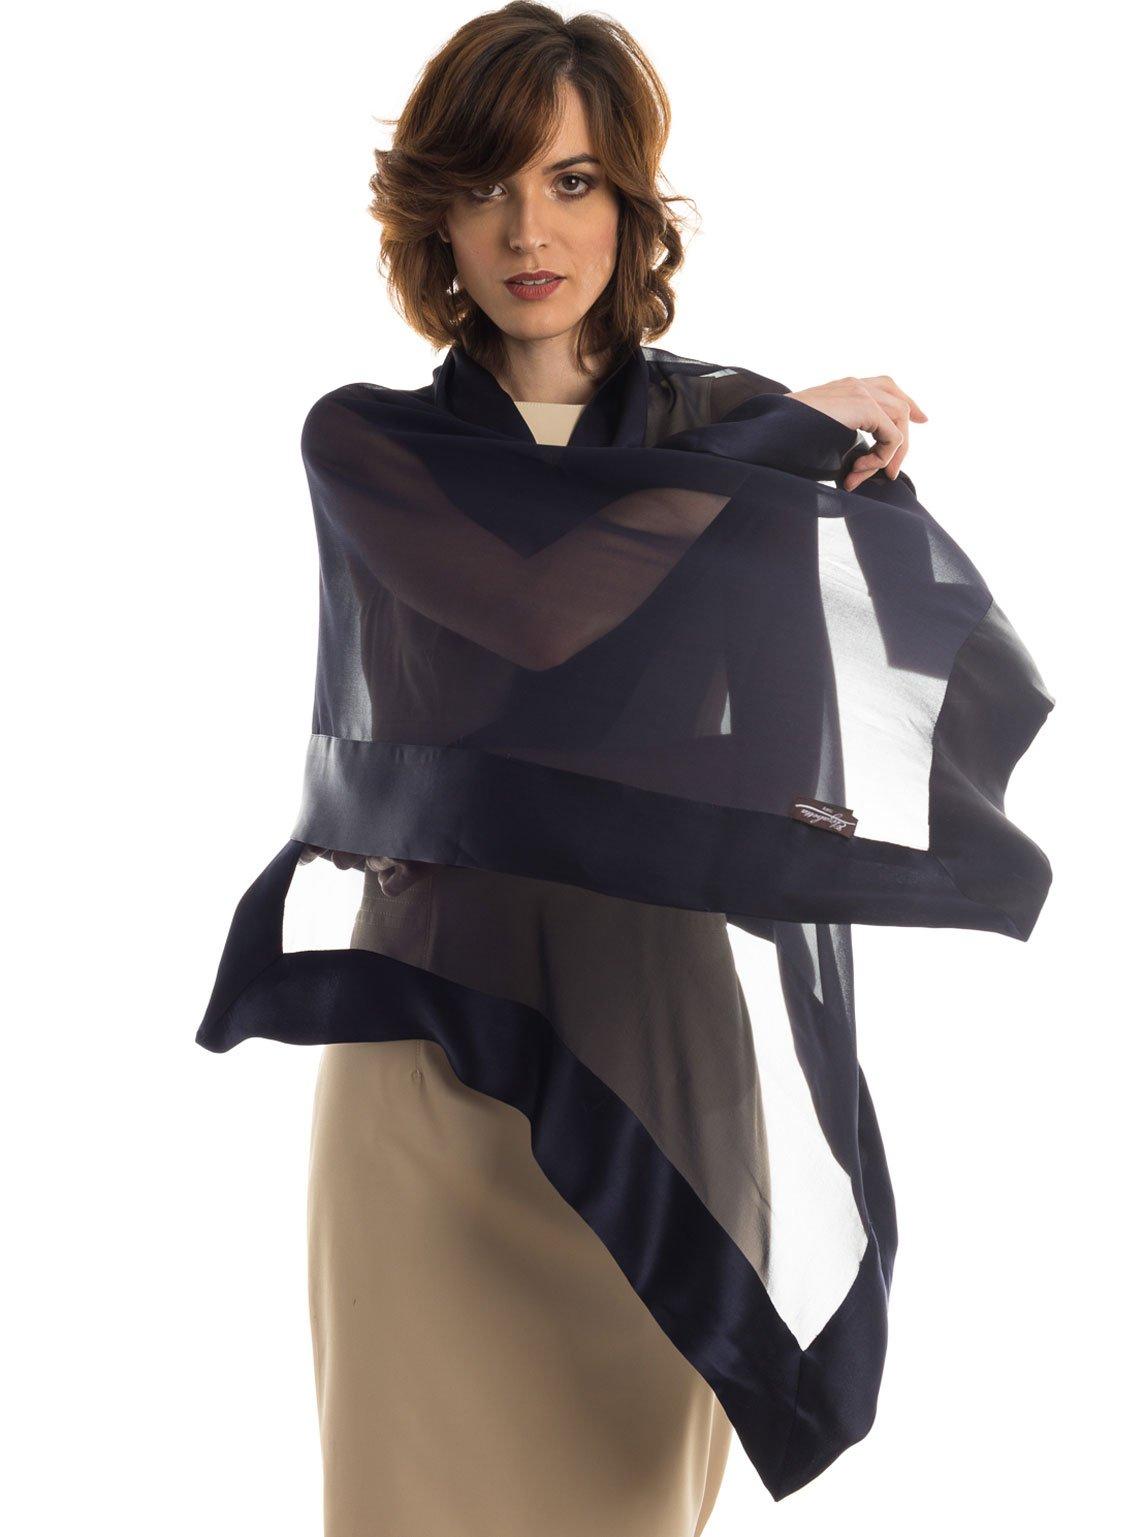 Elizabetta Womens Silk Scarf Wrap Shawl, Extra Large, Made in Italy (Navy Blue)